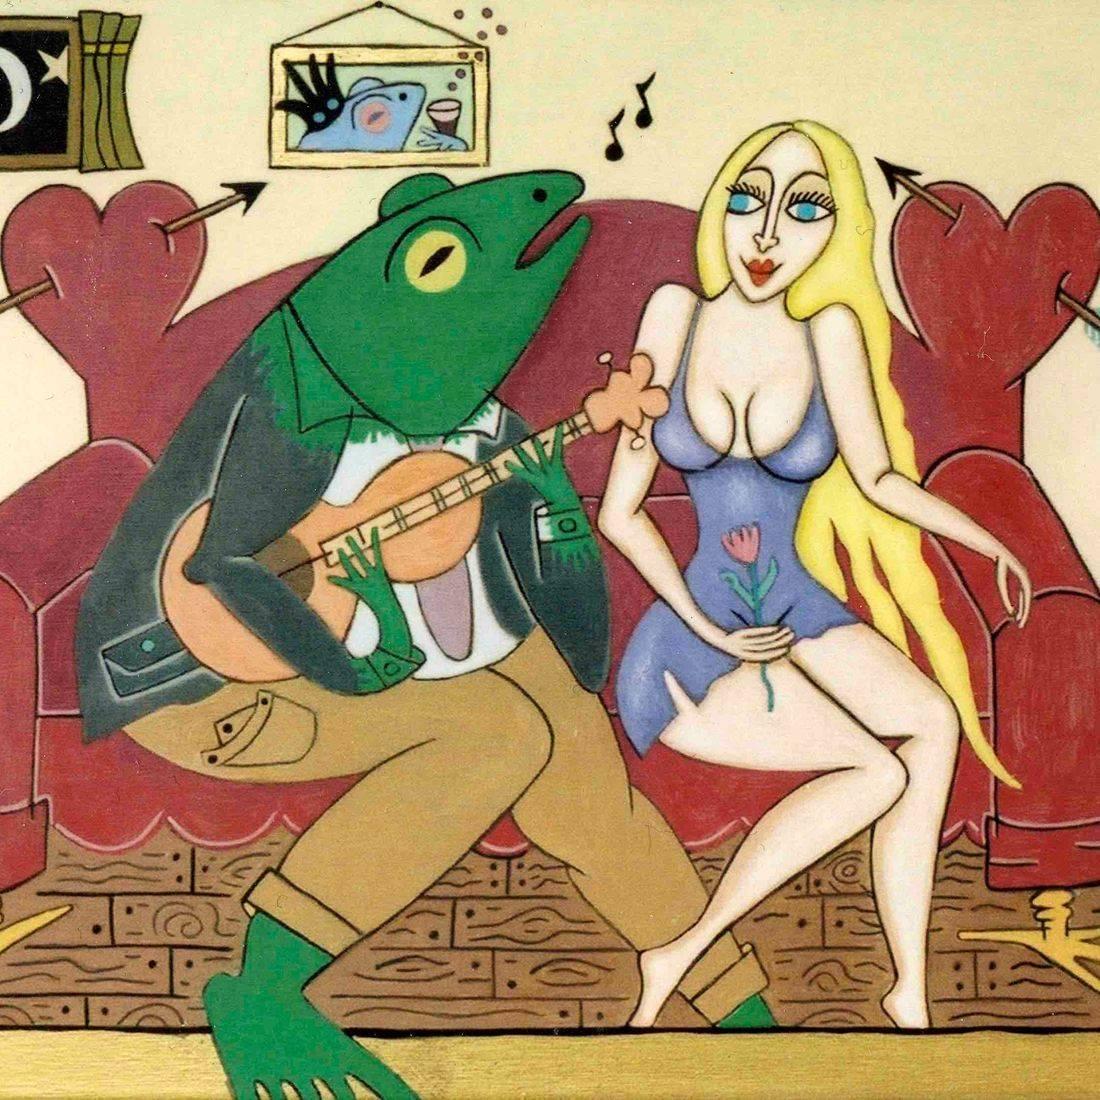 Serenade, Cantar Las Mananitas, Frog, Blonde, Romance, Love, Lust, The True Adventures of the Frog and Blonde